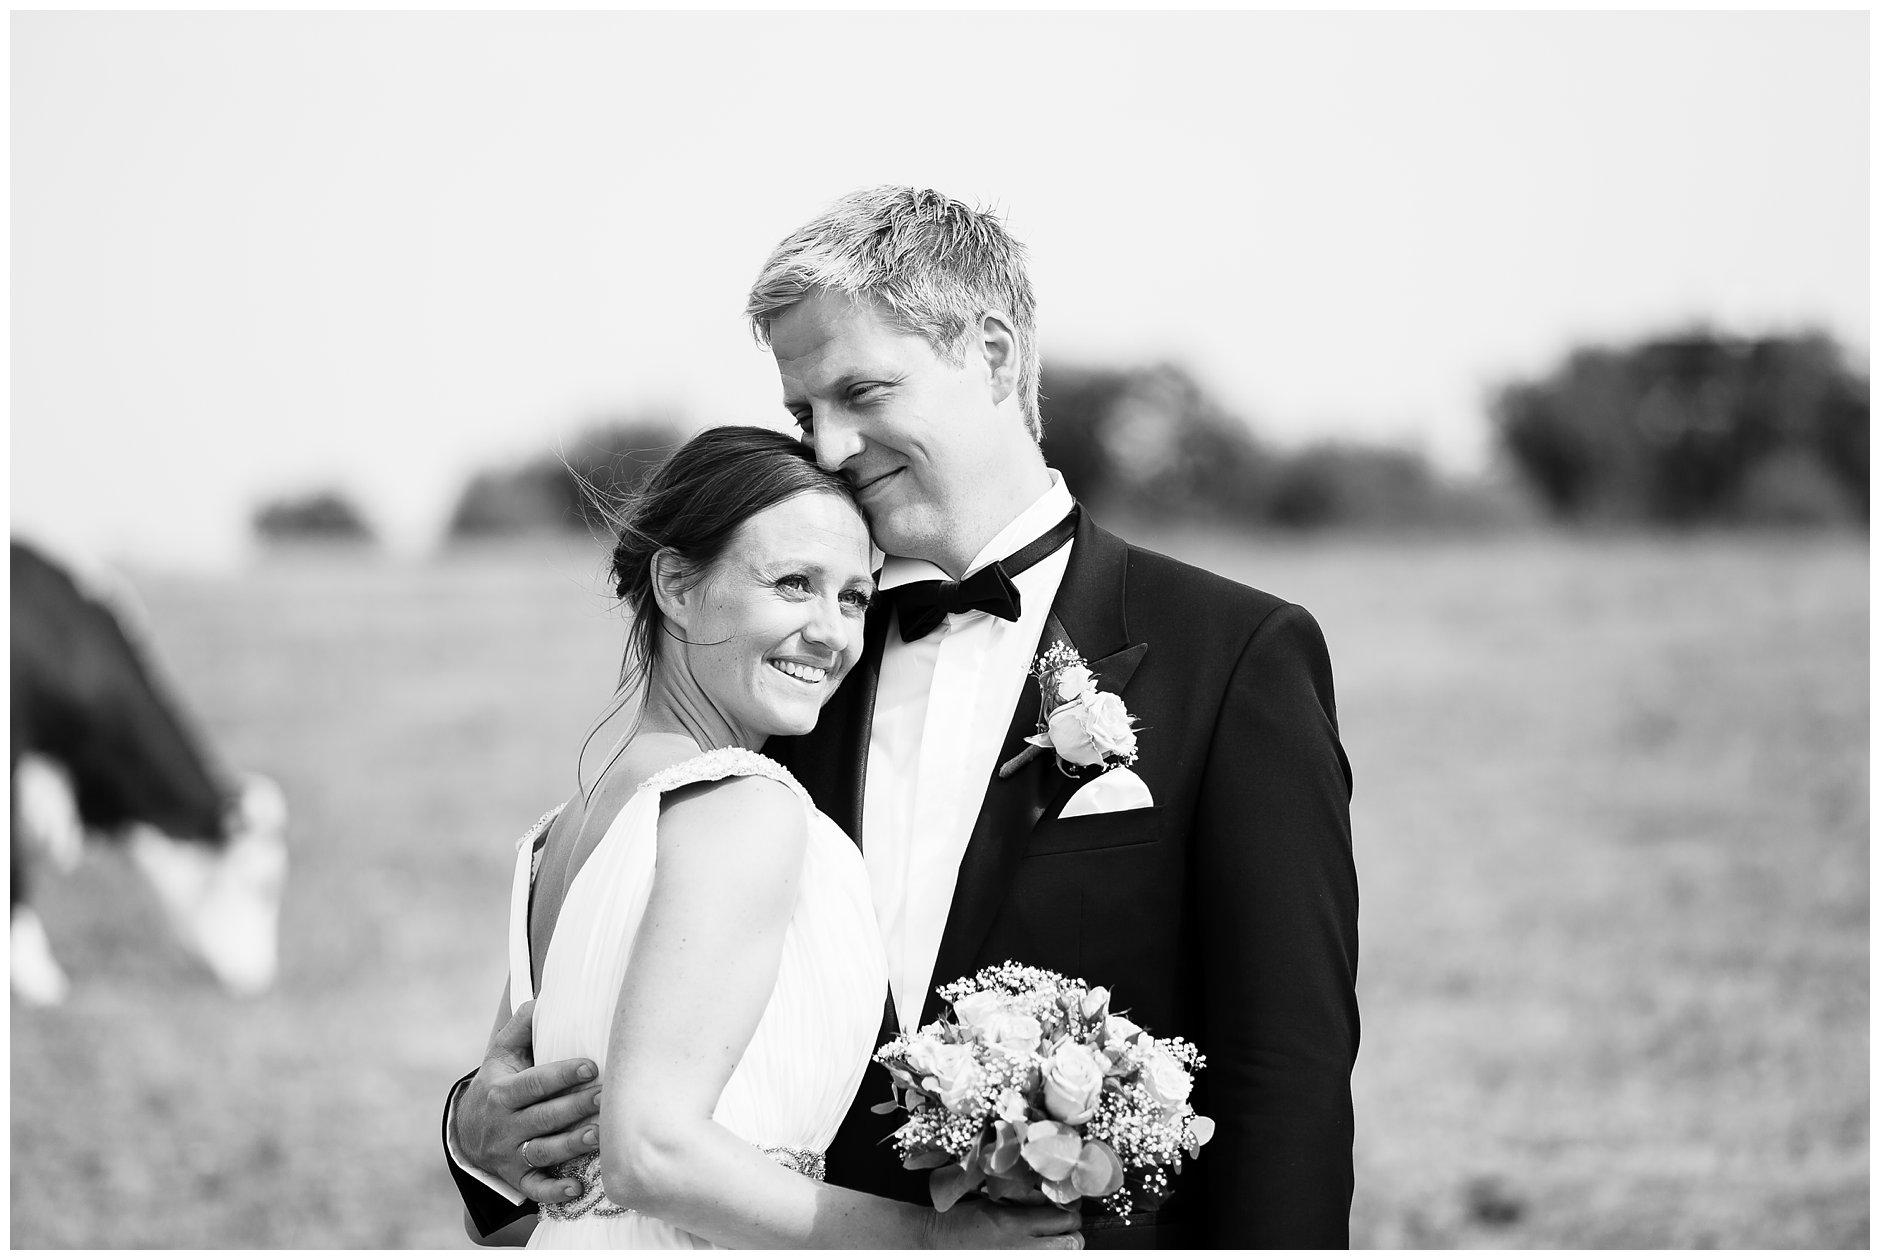 Bryllupsfotografering Jomfruland utendørs vielse